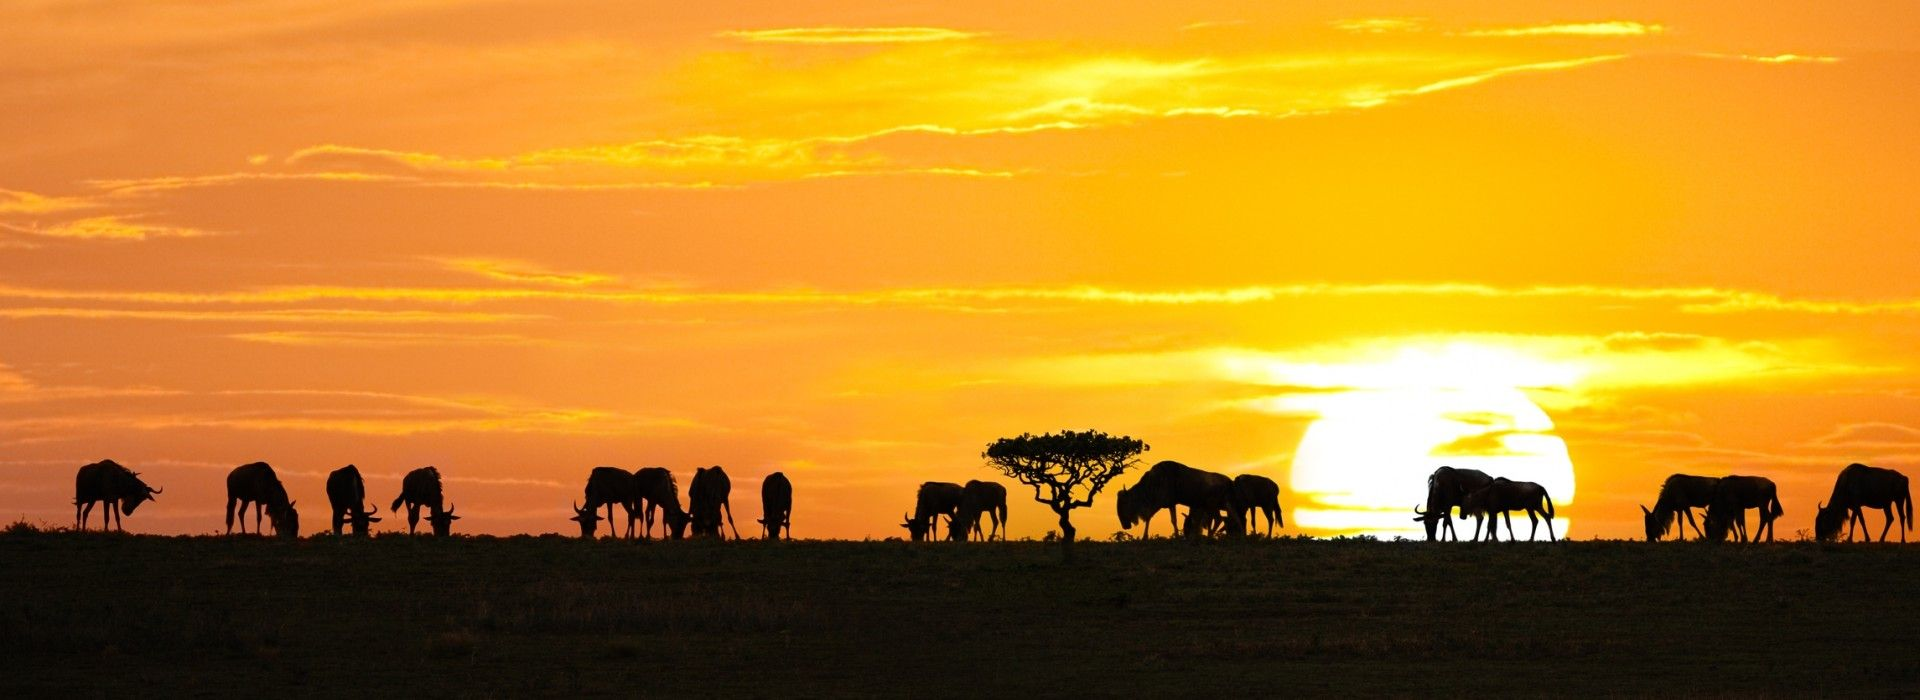 Beach, romance, getaways and relaxation Tours in Tanzania Safari Parks